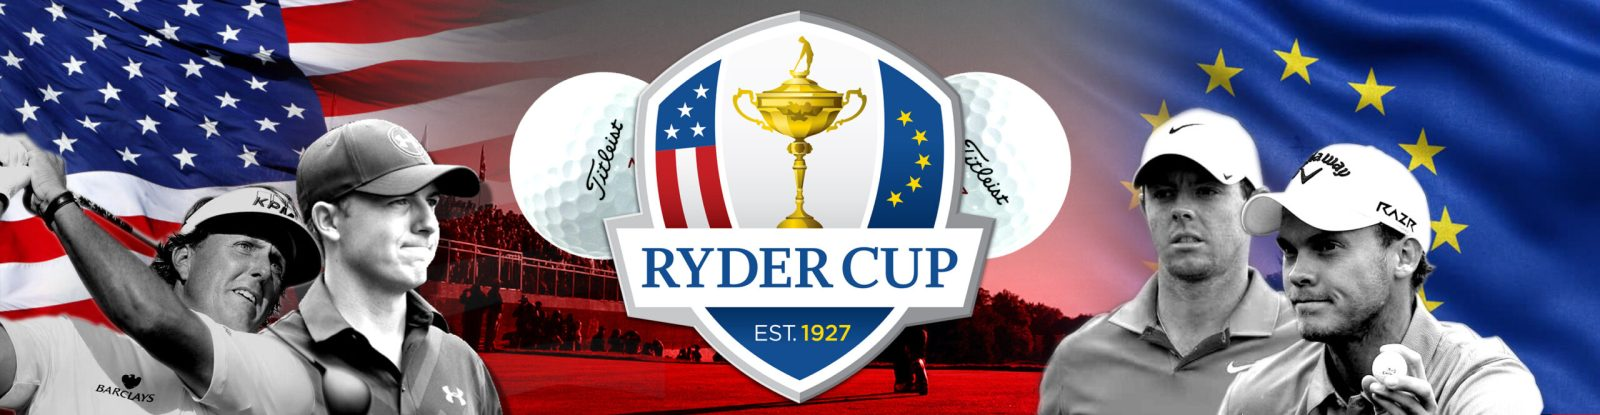 Ryder-Cup-Banner 2020